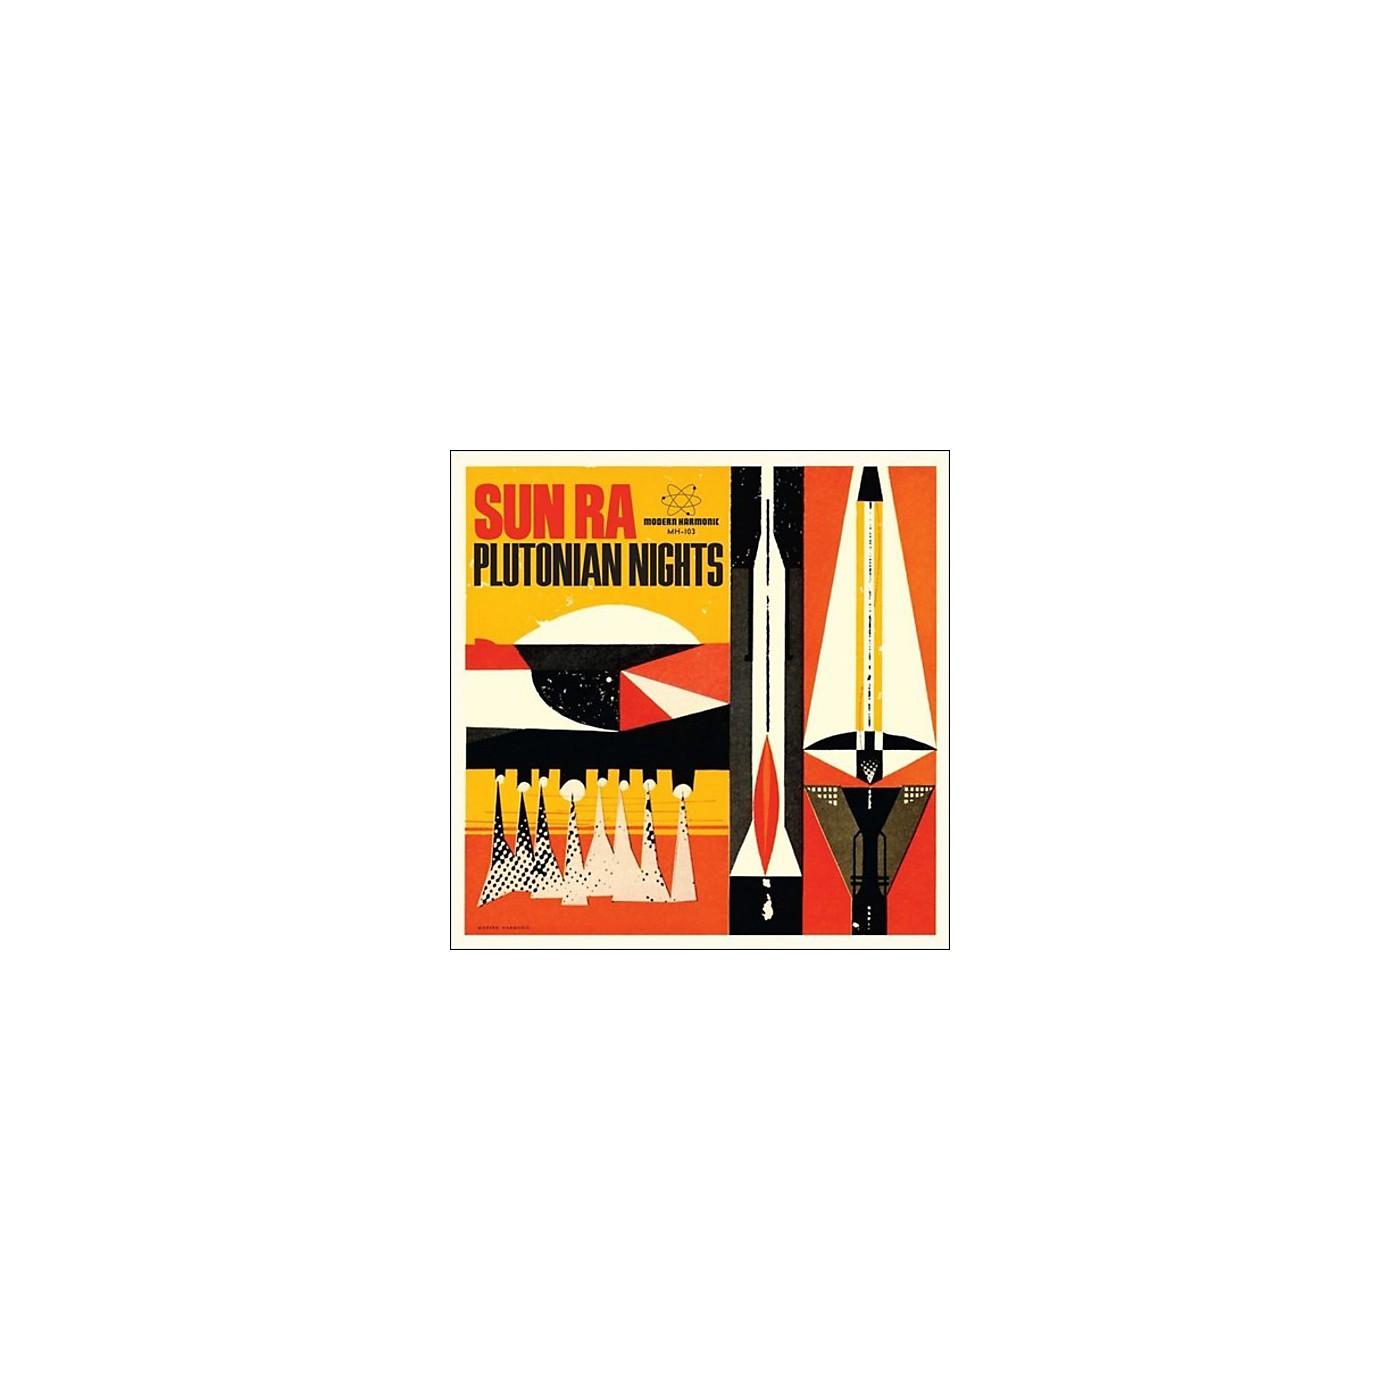 Alliance Sun Ra - Plutonian Nights/Reflects Motion (Part One) thumbnail